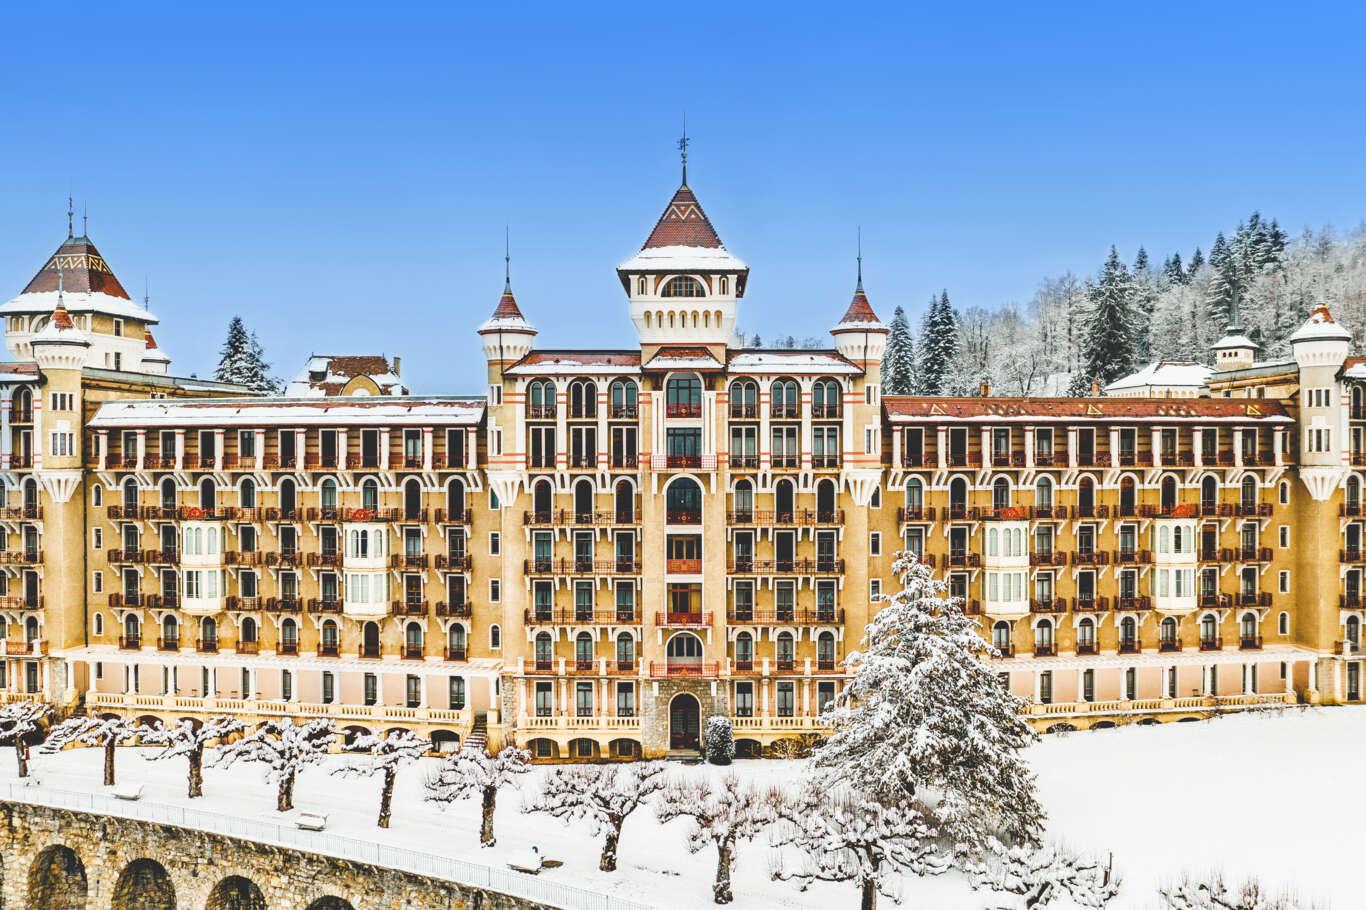 SHMS – Swiss Hotel Management School 3